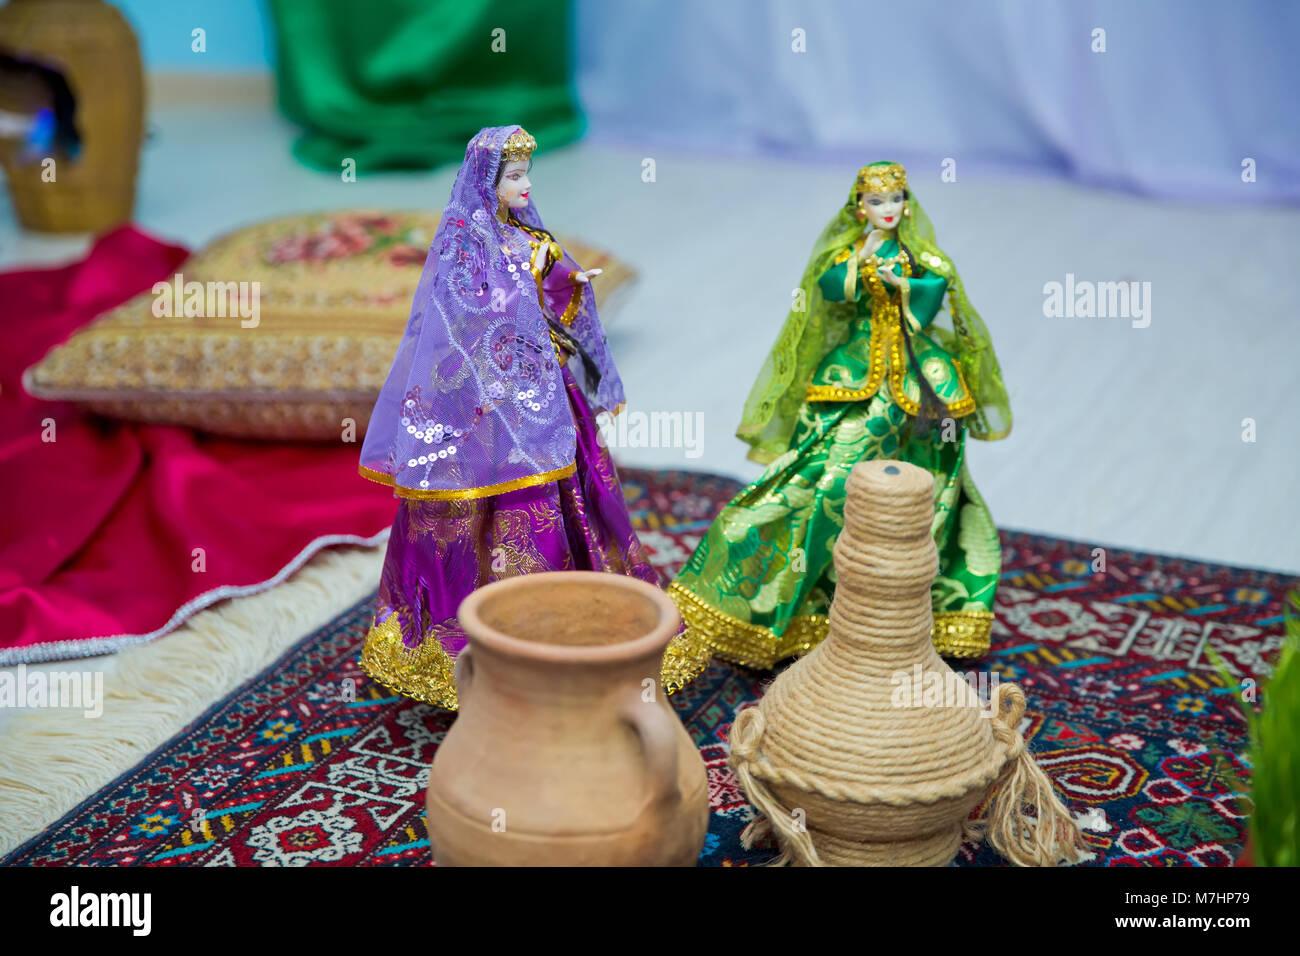 Azerbaijan national womens puppet wear. Ancient Azerbaijan military sword . Azerbaijani national costume - Stock Image